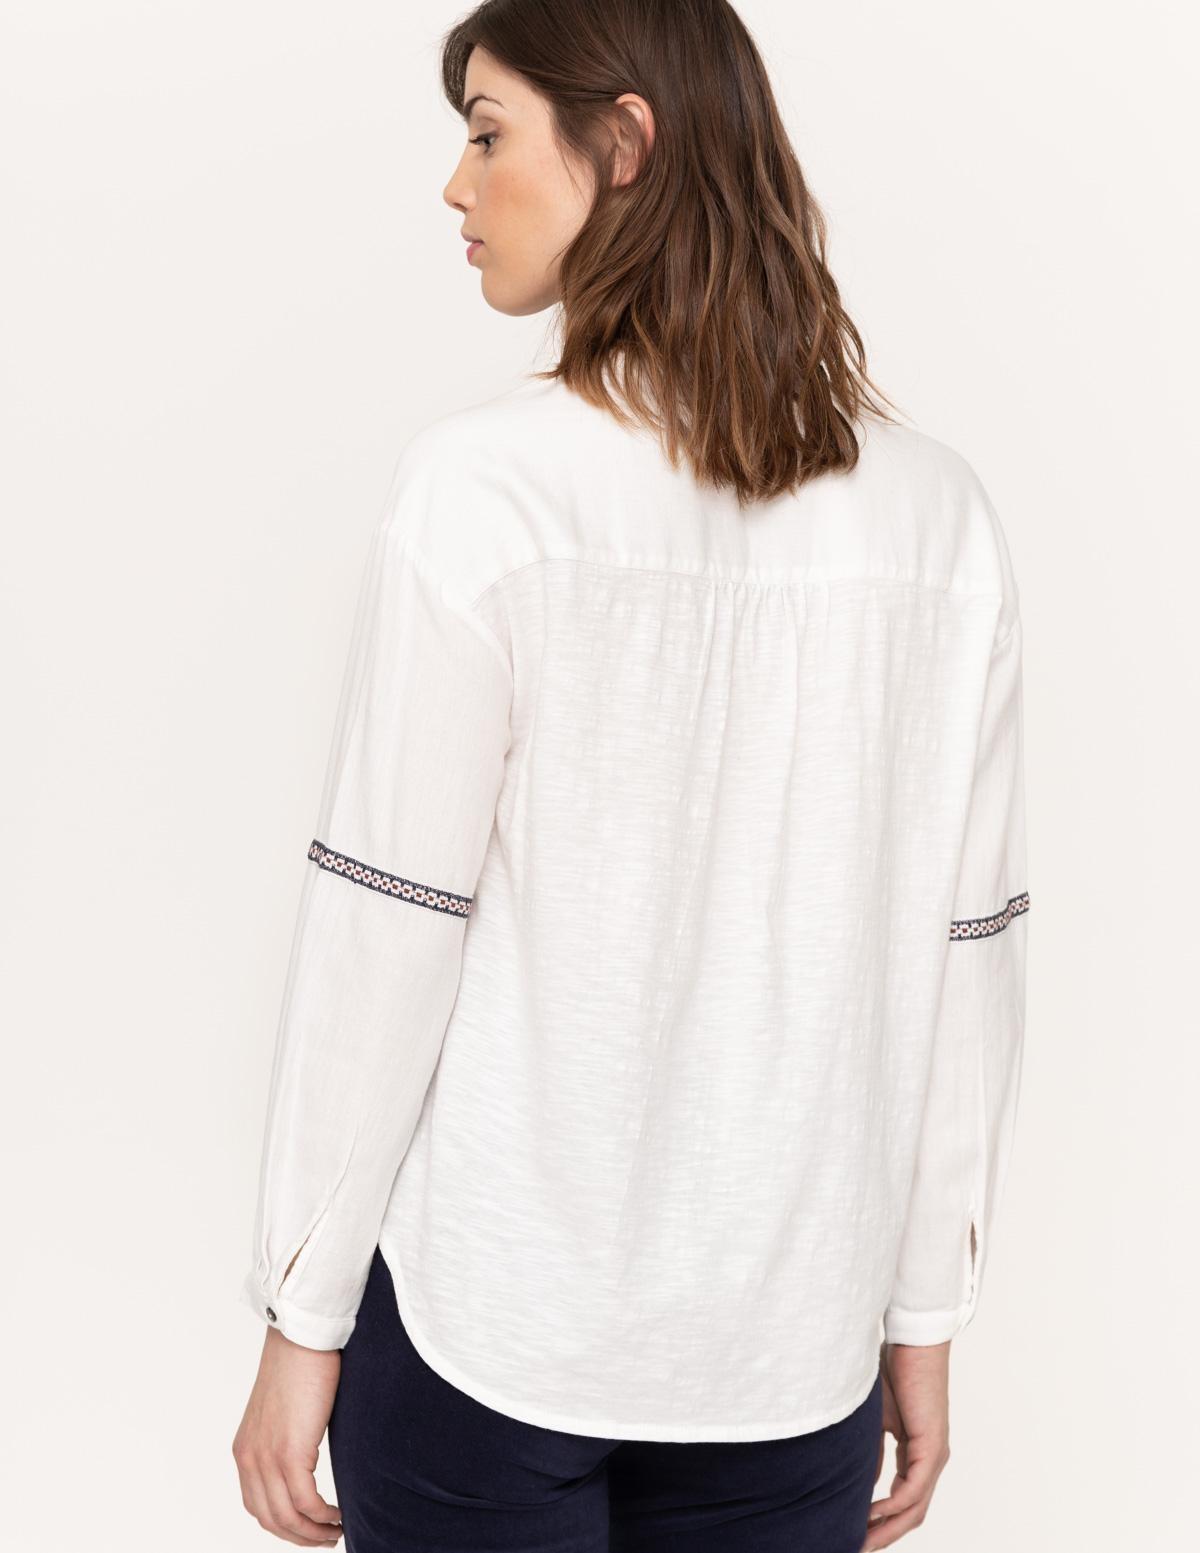 Camisa cuello mao bordados - Ítem1